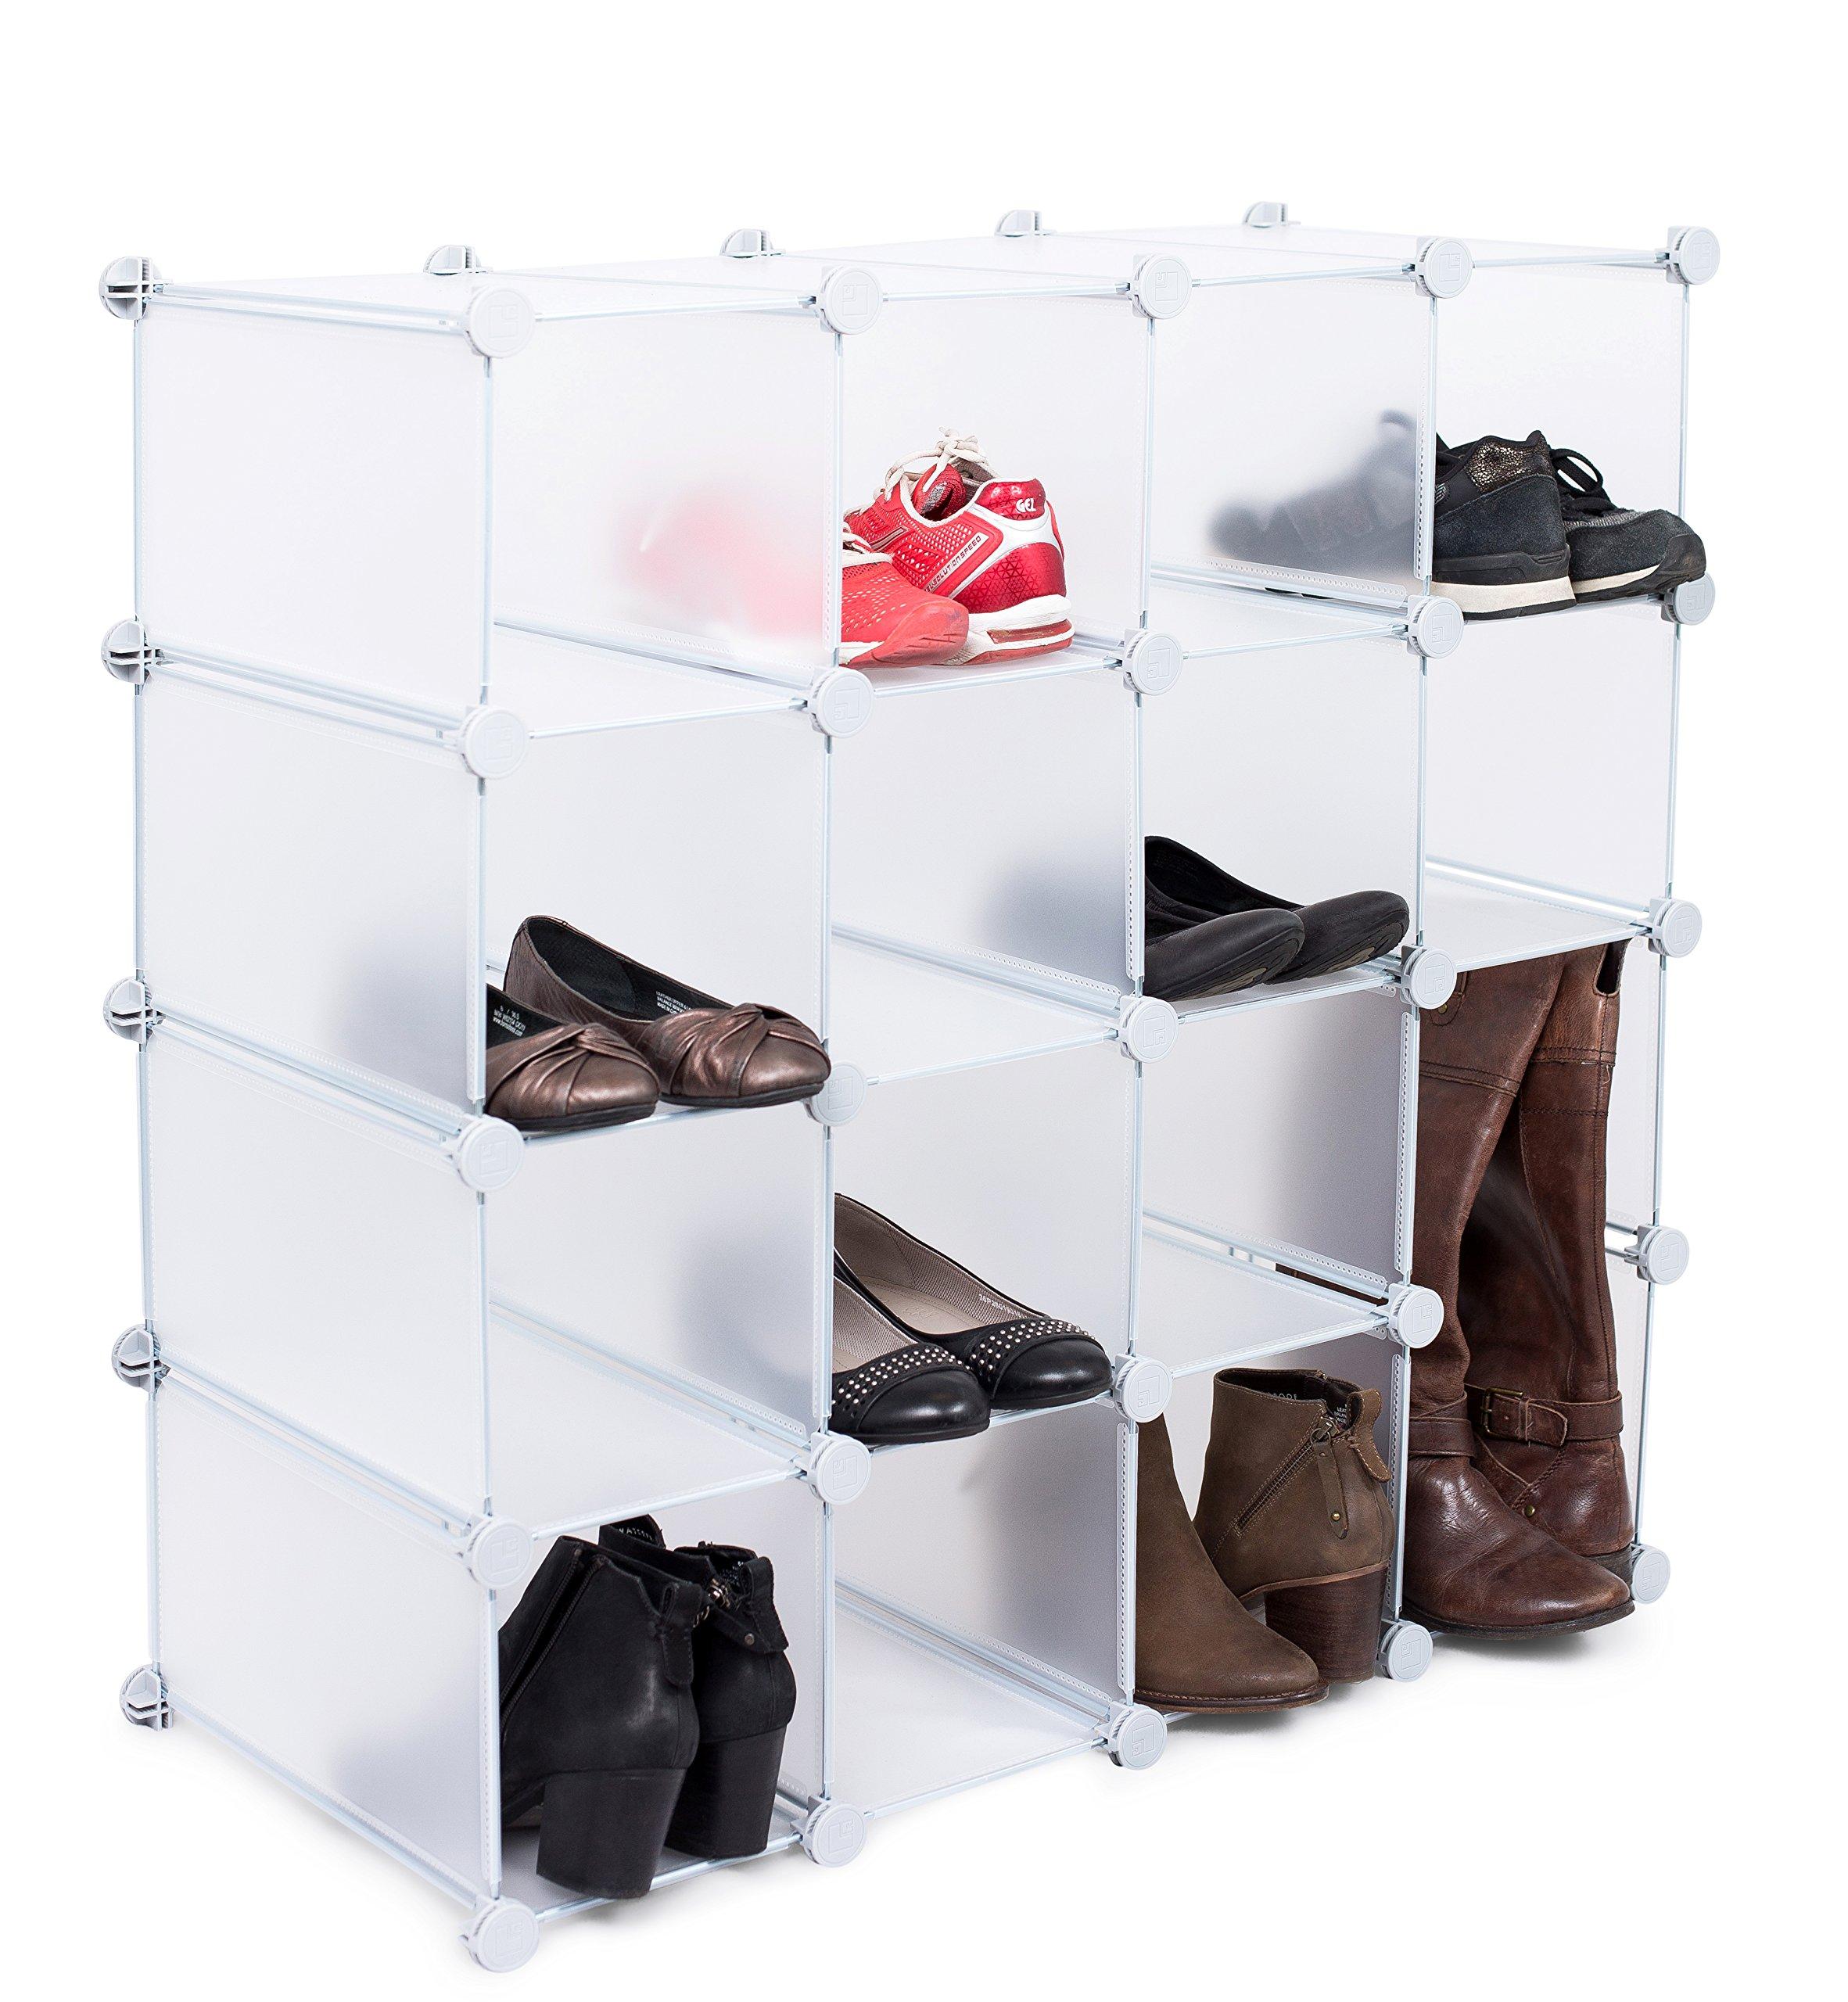 Internet's Best Plastic Shoe Storage Cube Organizer | 16 Cubby | Interlocking Shoe & Boot Rack | Under Stairs Shoe Organization Shelf | Cabinet Closet Modular Shelving | Store Clothes, Toys, Handbag